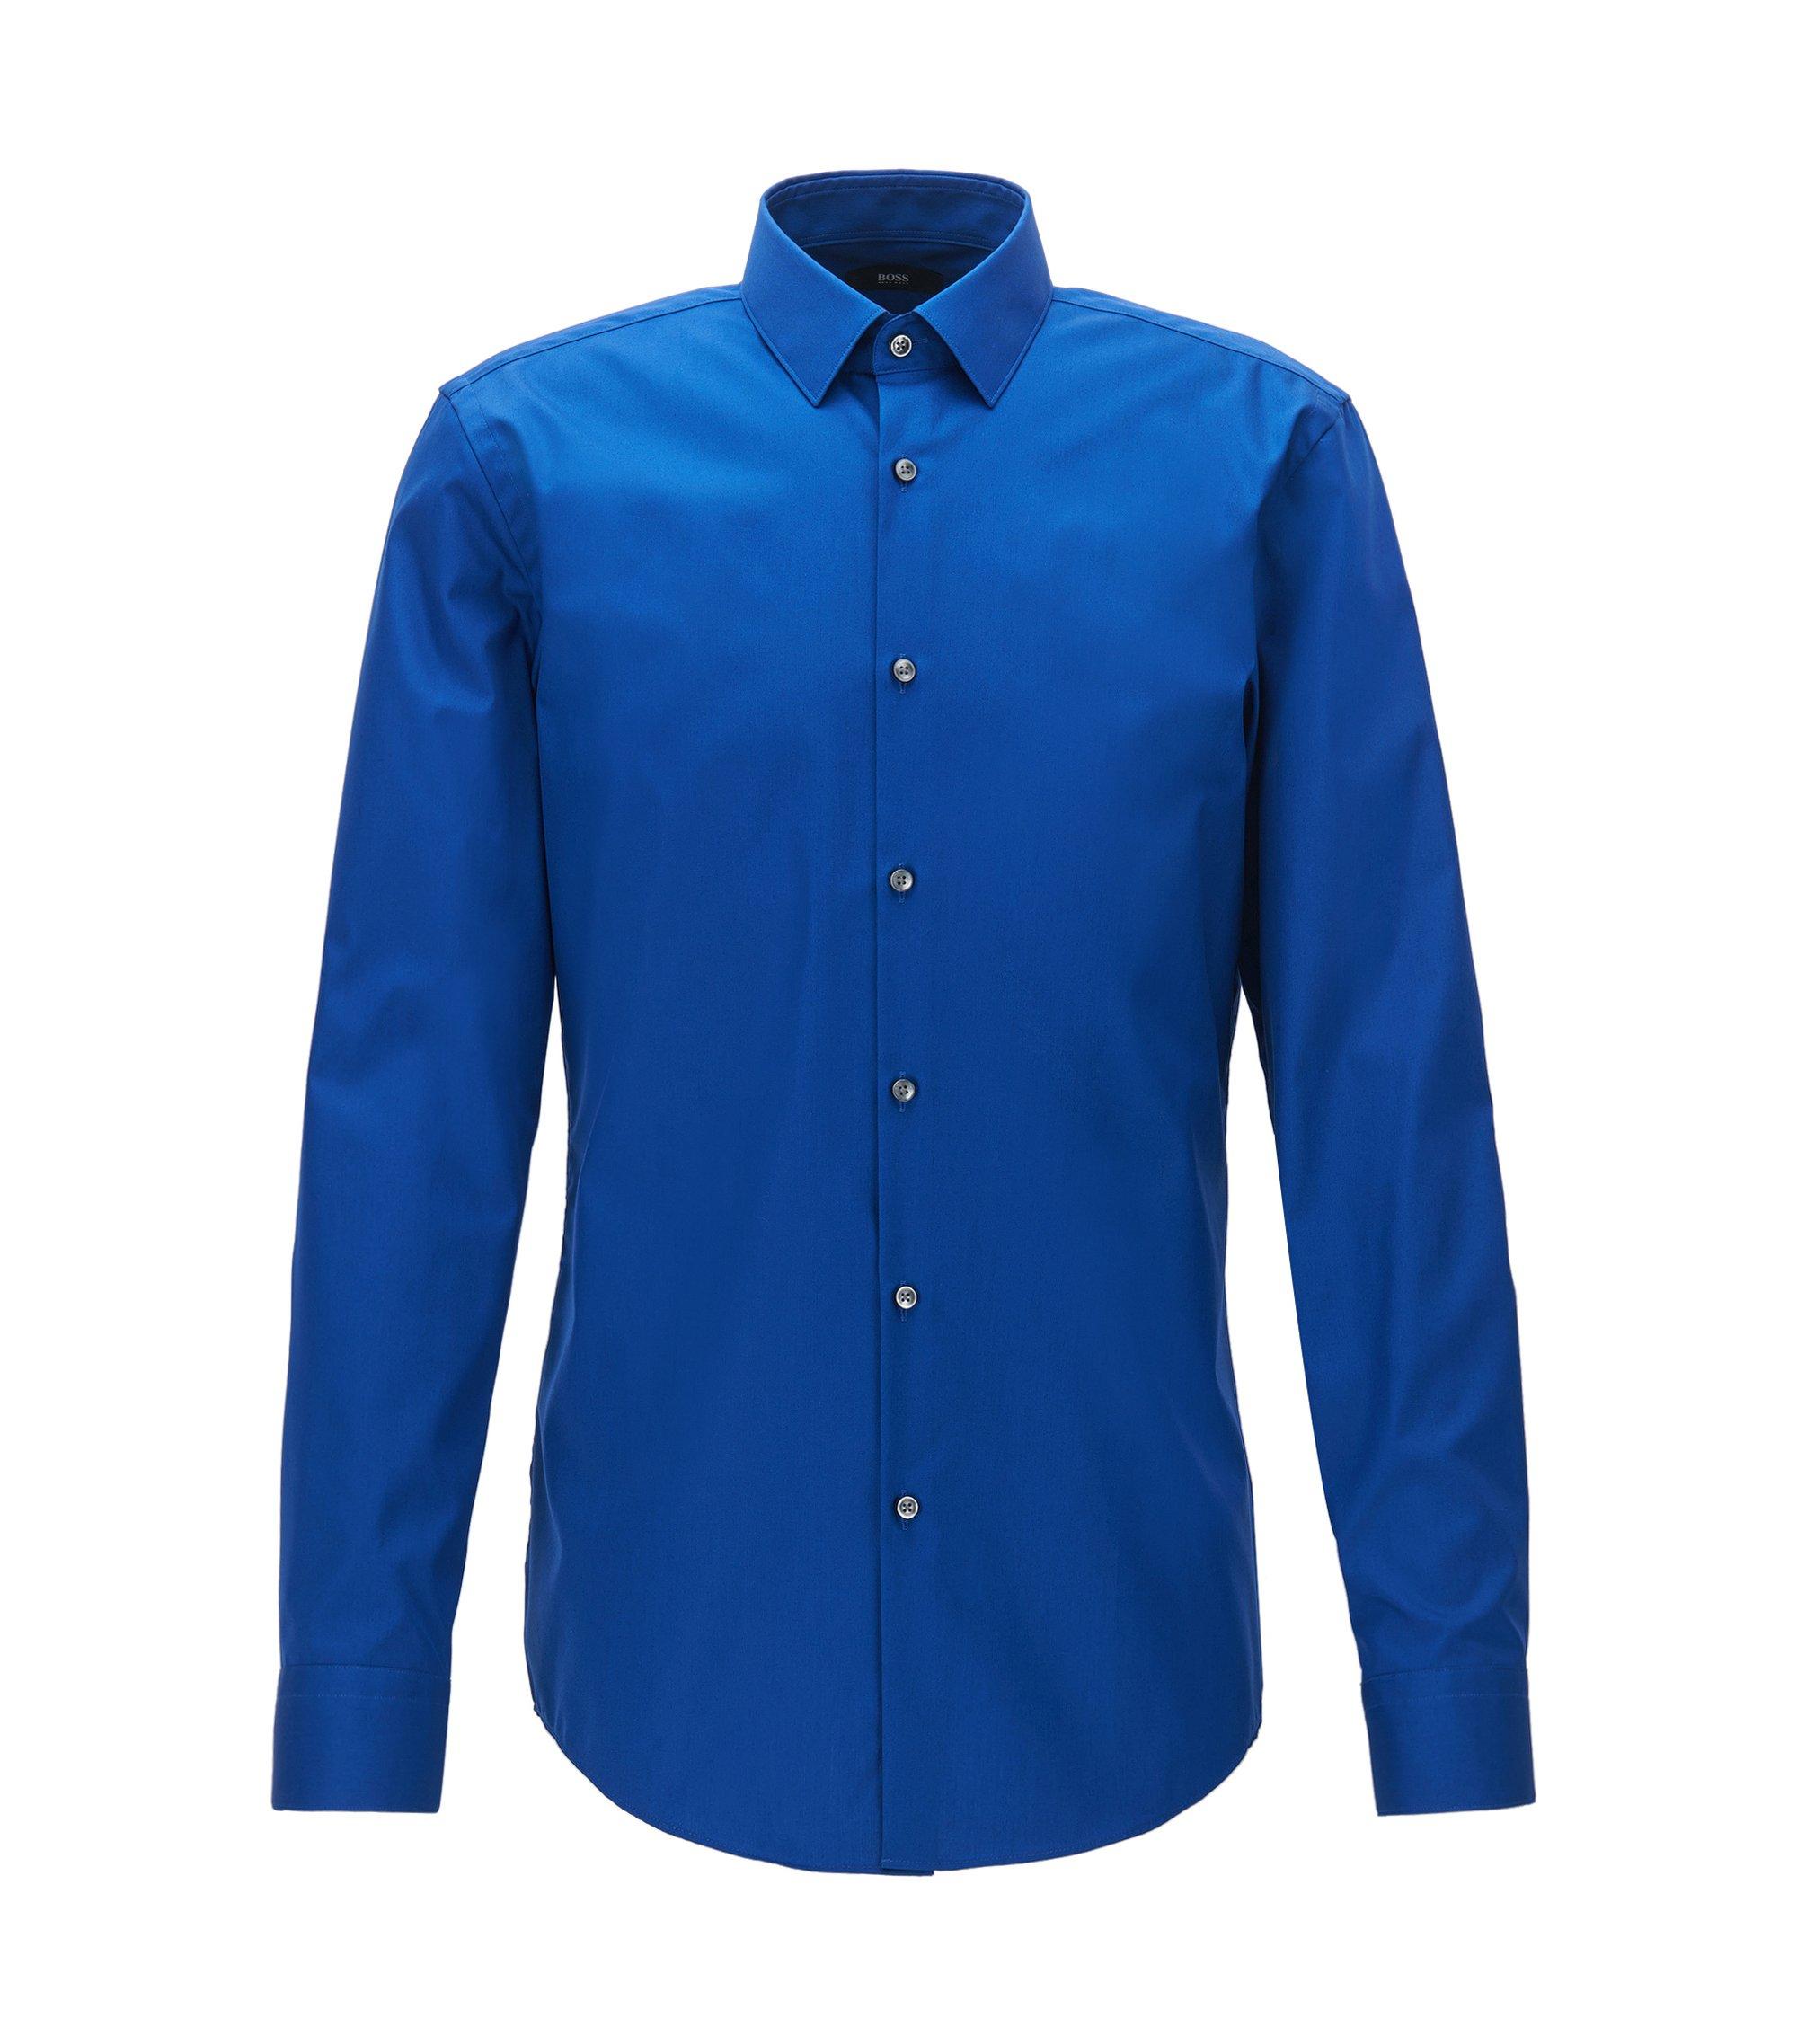 Easy Iron Cotton Dress Shirt, Slim Fit | Isko, Blue